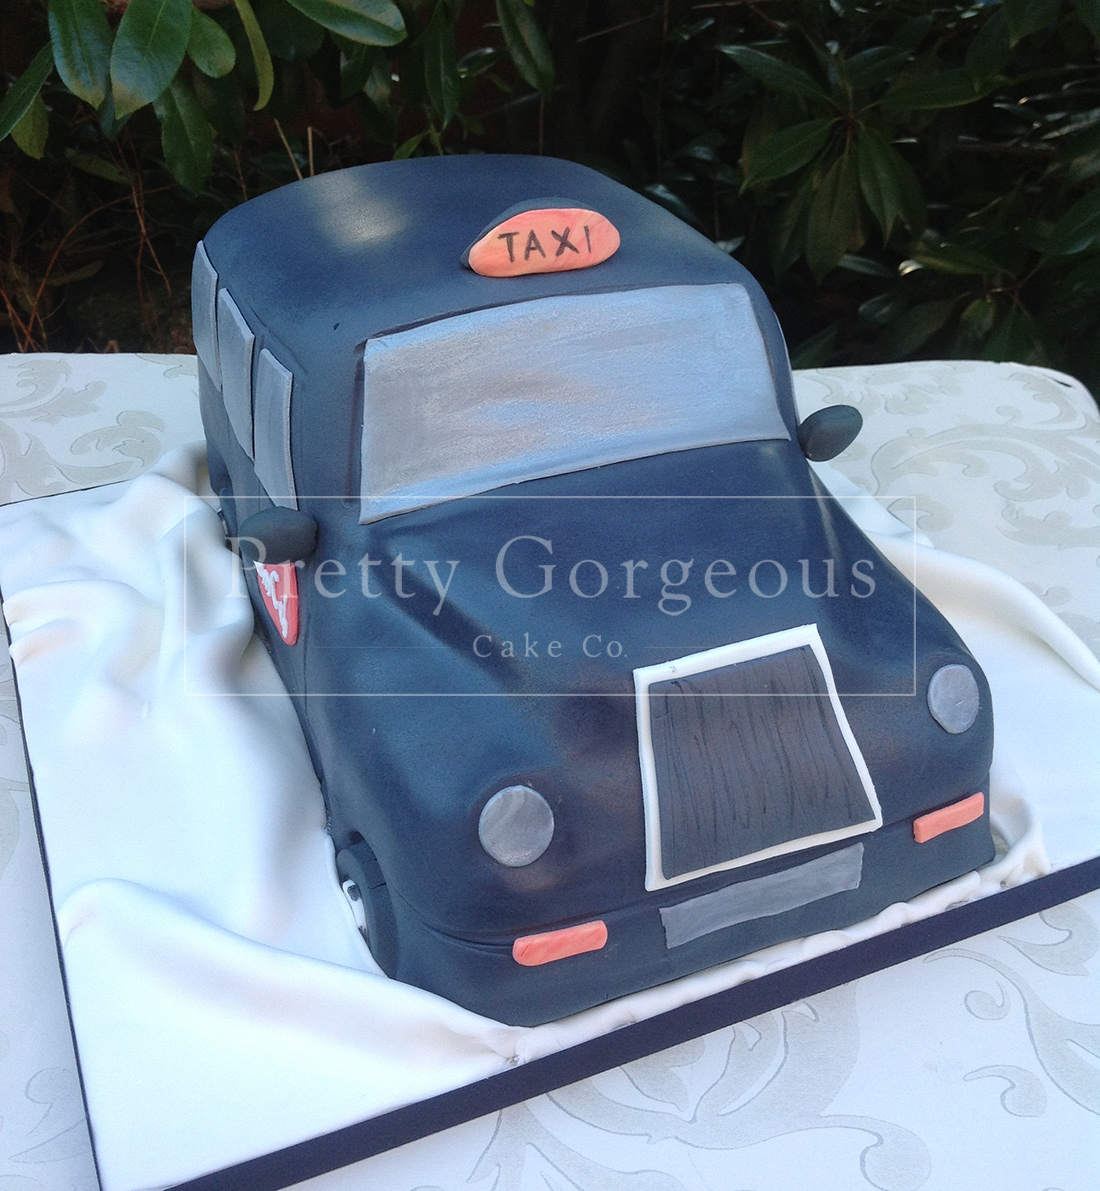 Black Taxi Cake Party Birthday